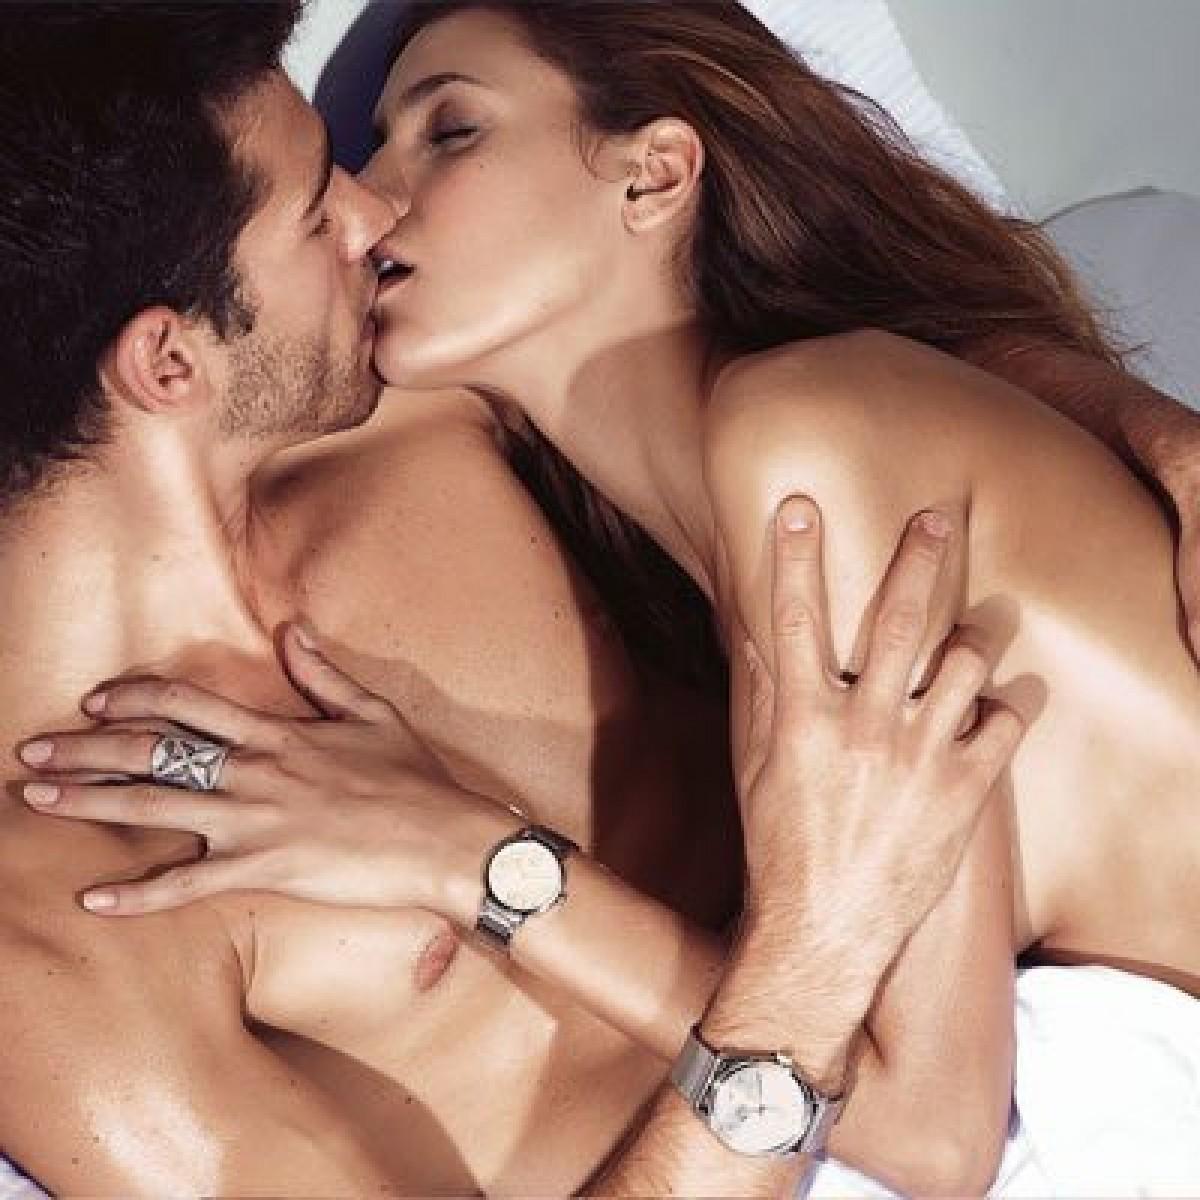 Vempayer fucking sex photos adult photos